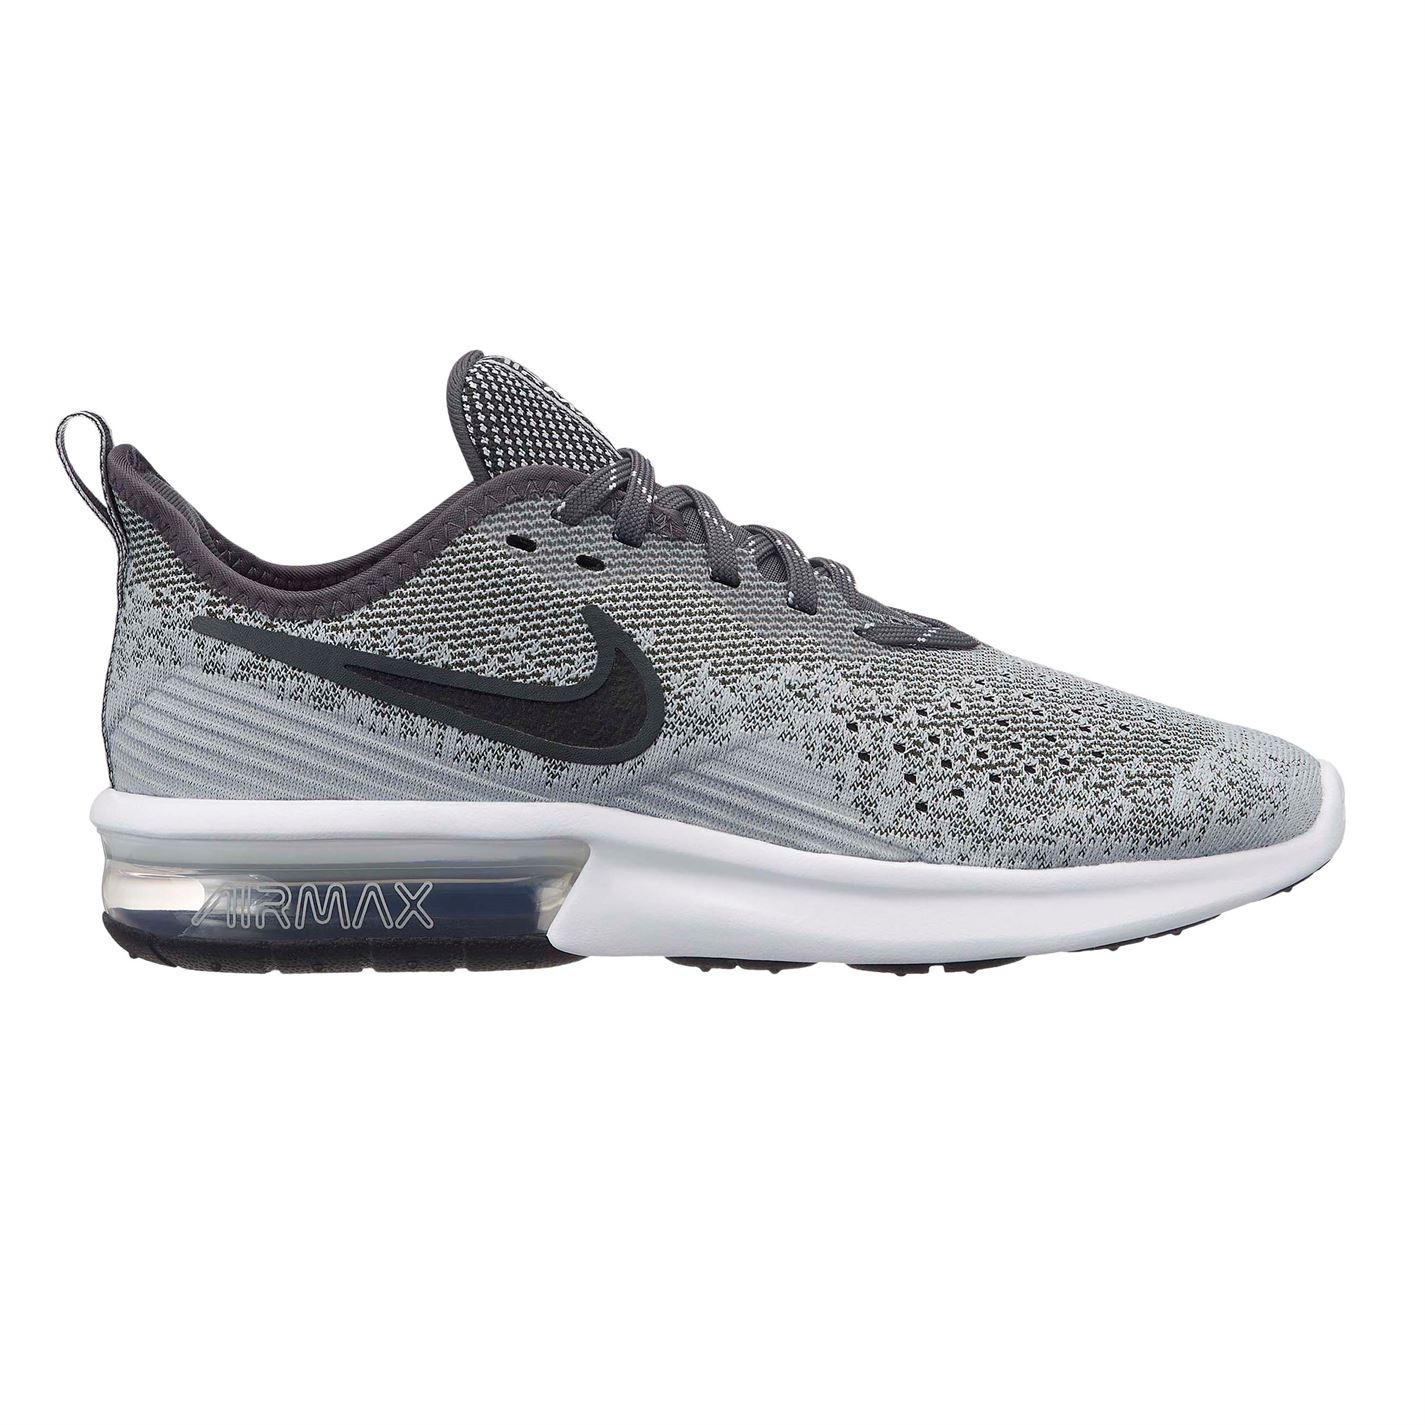 boty Nike Air Max Sequent 4 dámské Running